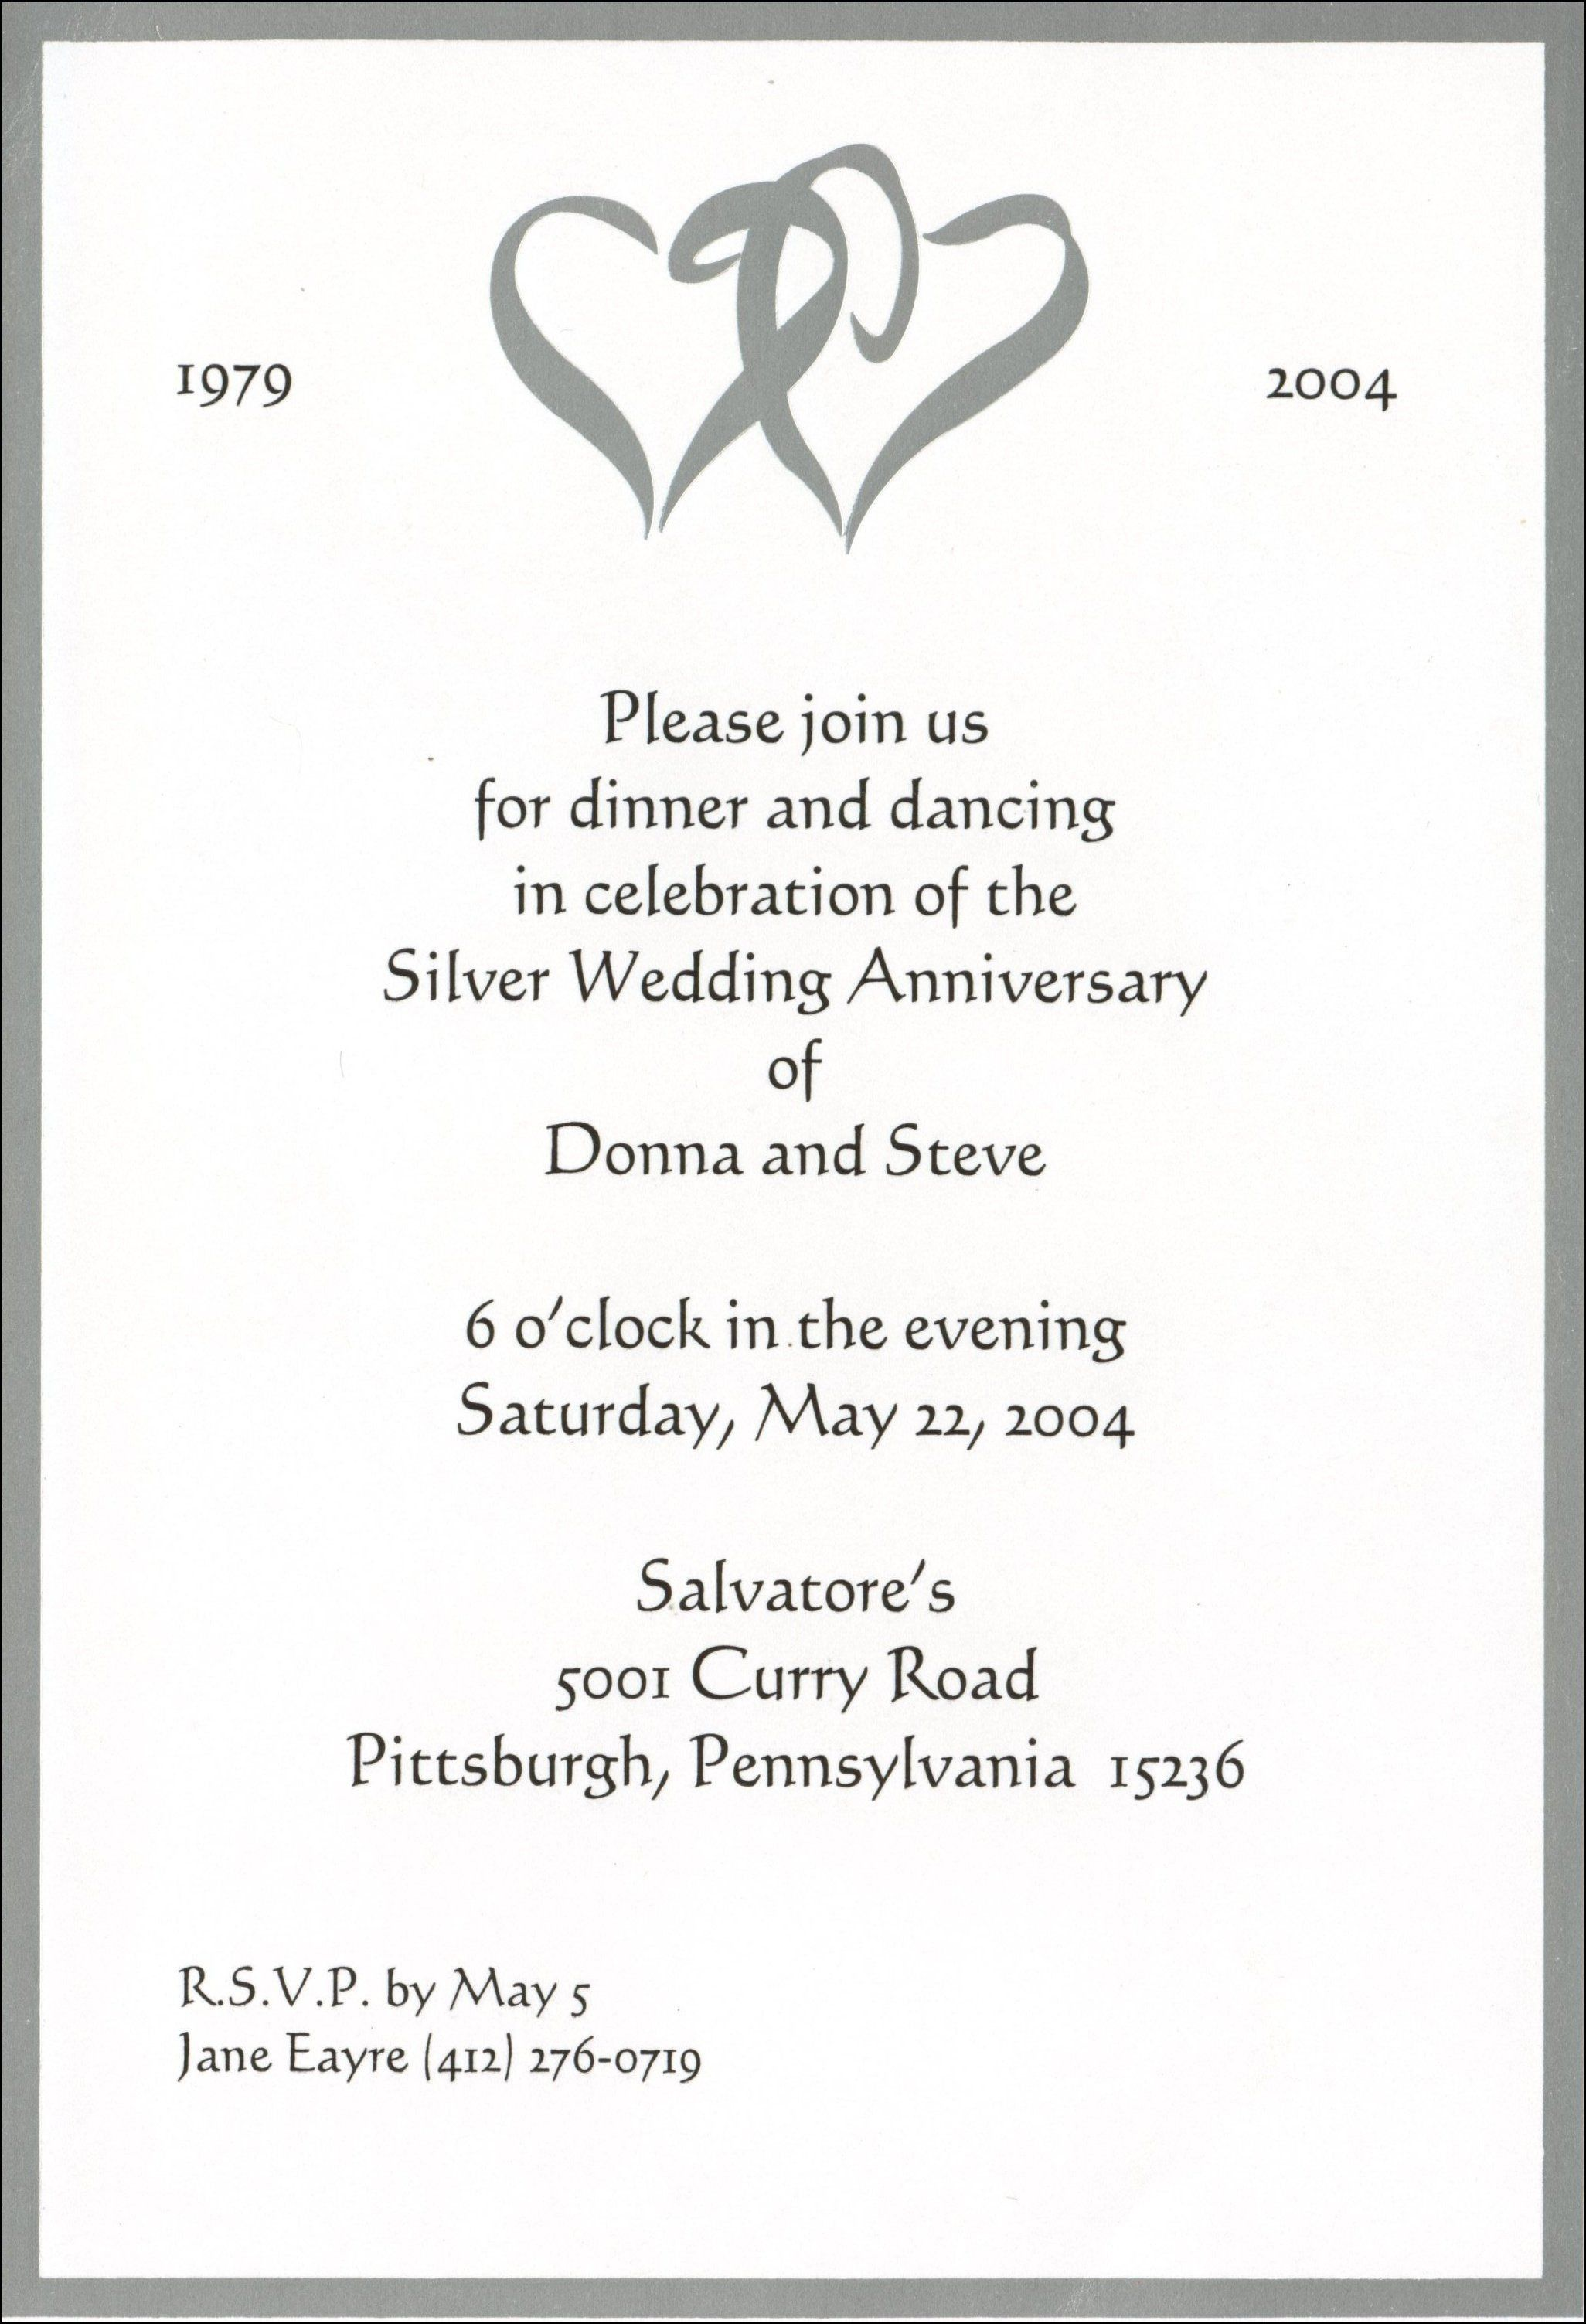 10th Wedding Anniversary Invitation Wording 50th wedding